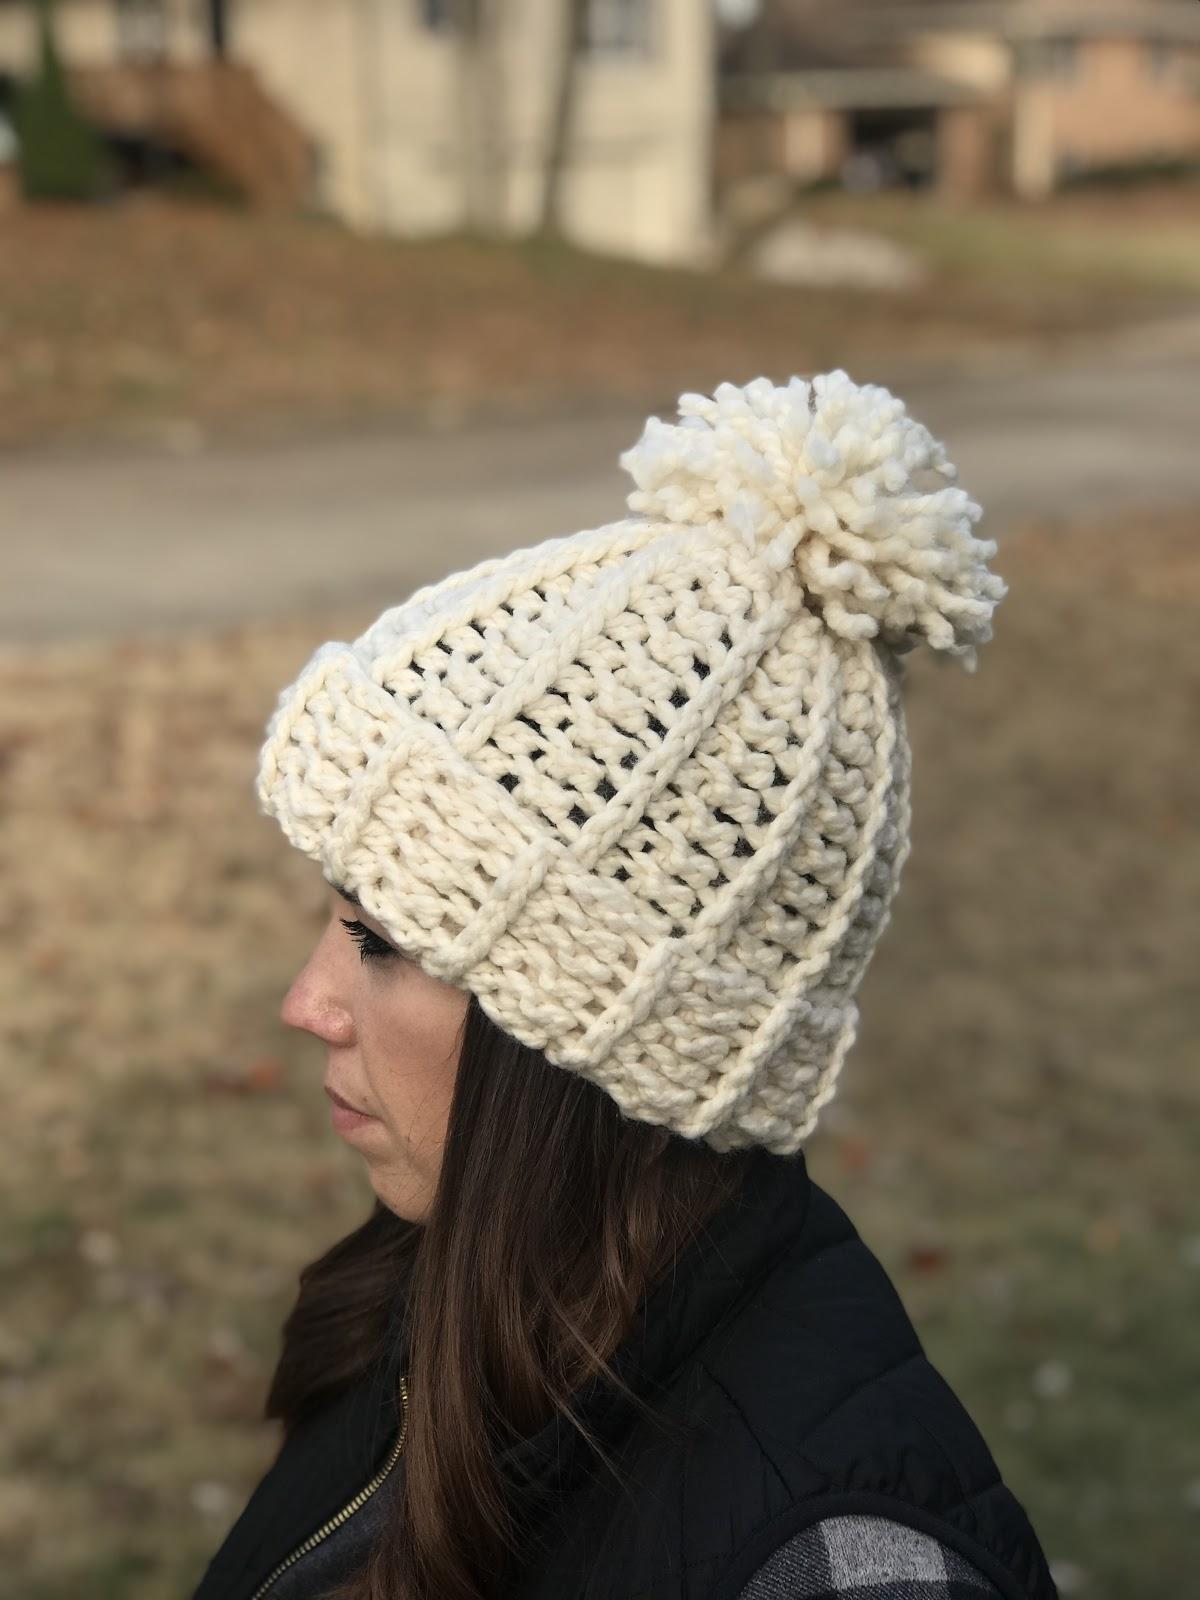 Crochet Beanie Crochet Hat The Jillie Beanie PomPom Beanie Adult Beanie Faux Fur Pom Winter Beanie Crochet Beanie Hat Child Beanie